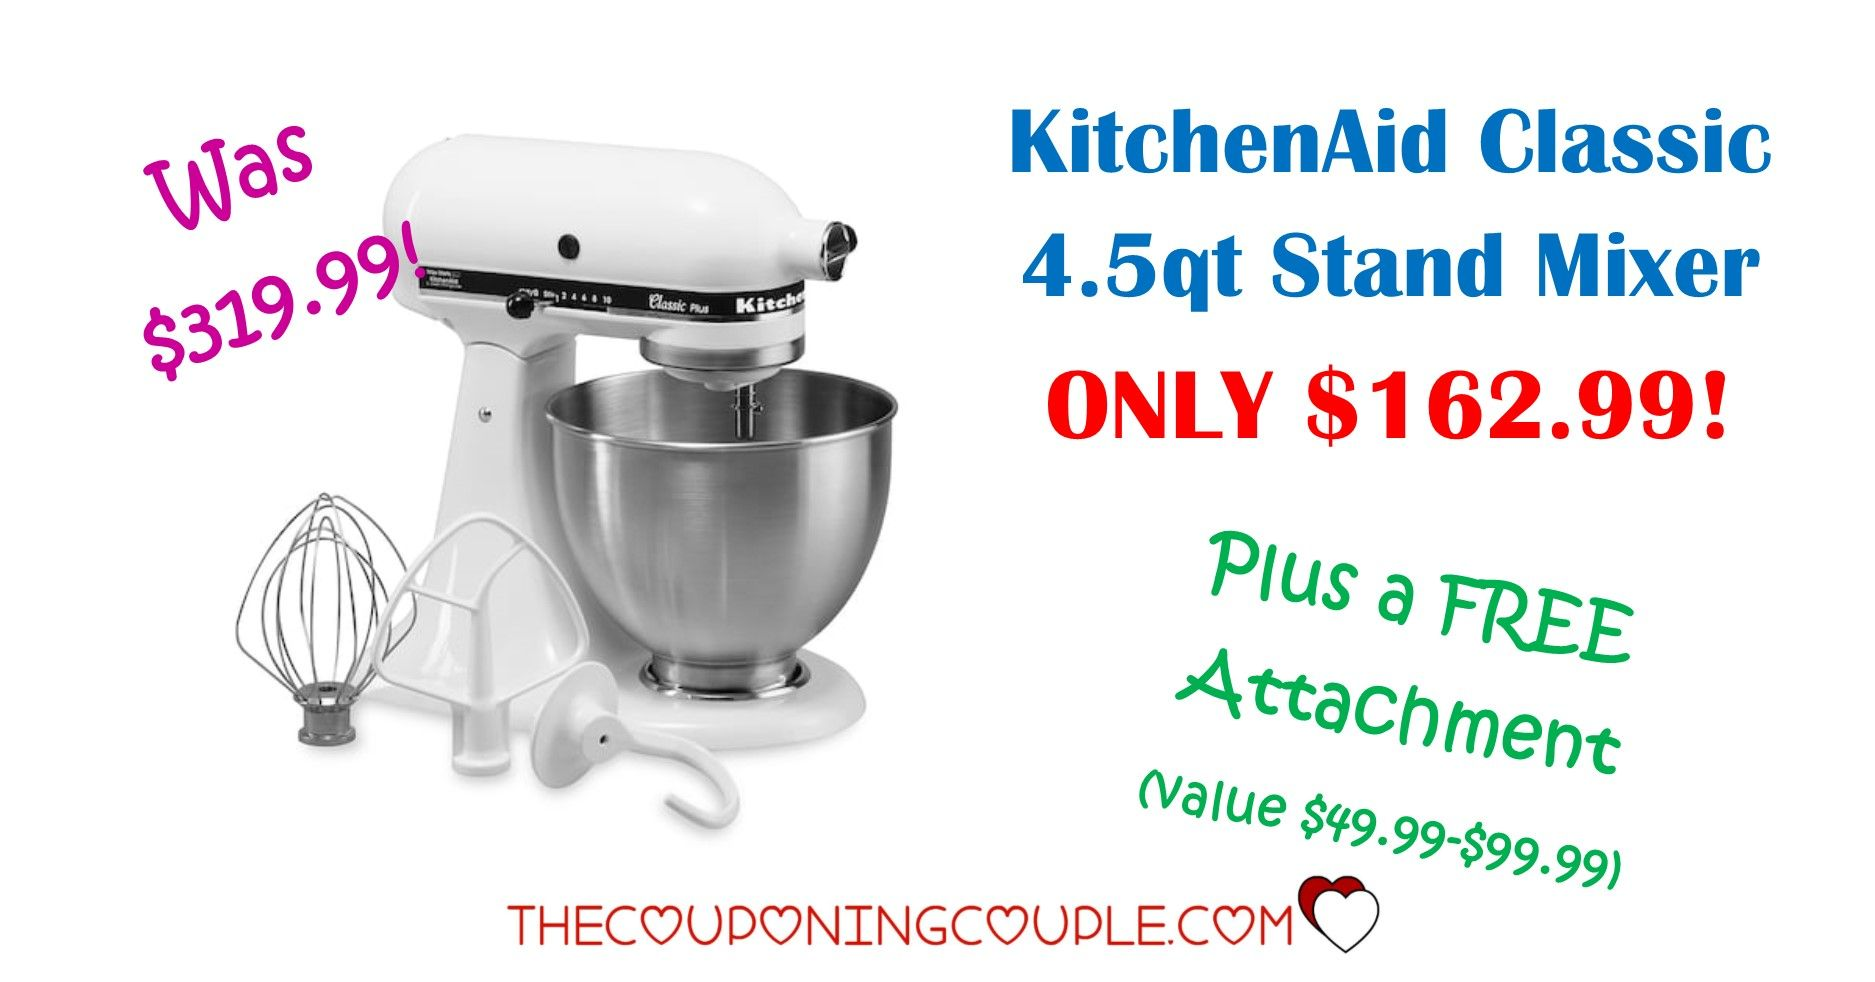 Kitchenaid classic plus 45 qt stand mixer only 12999